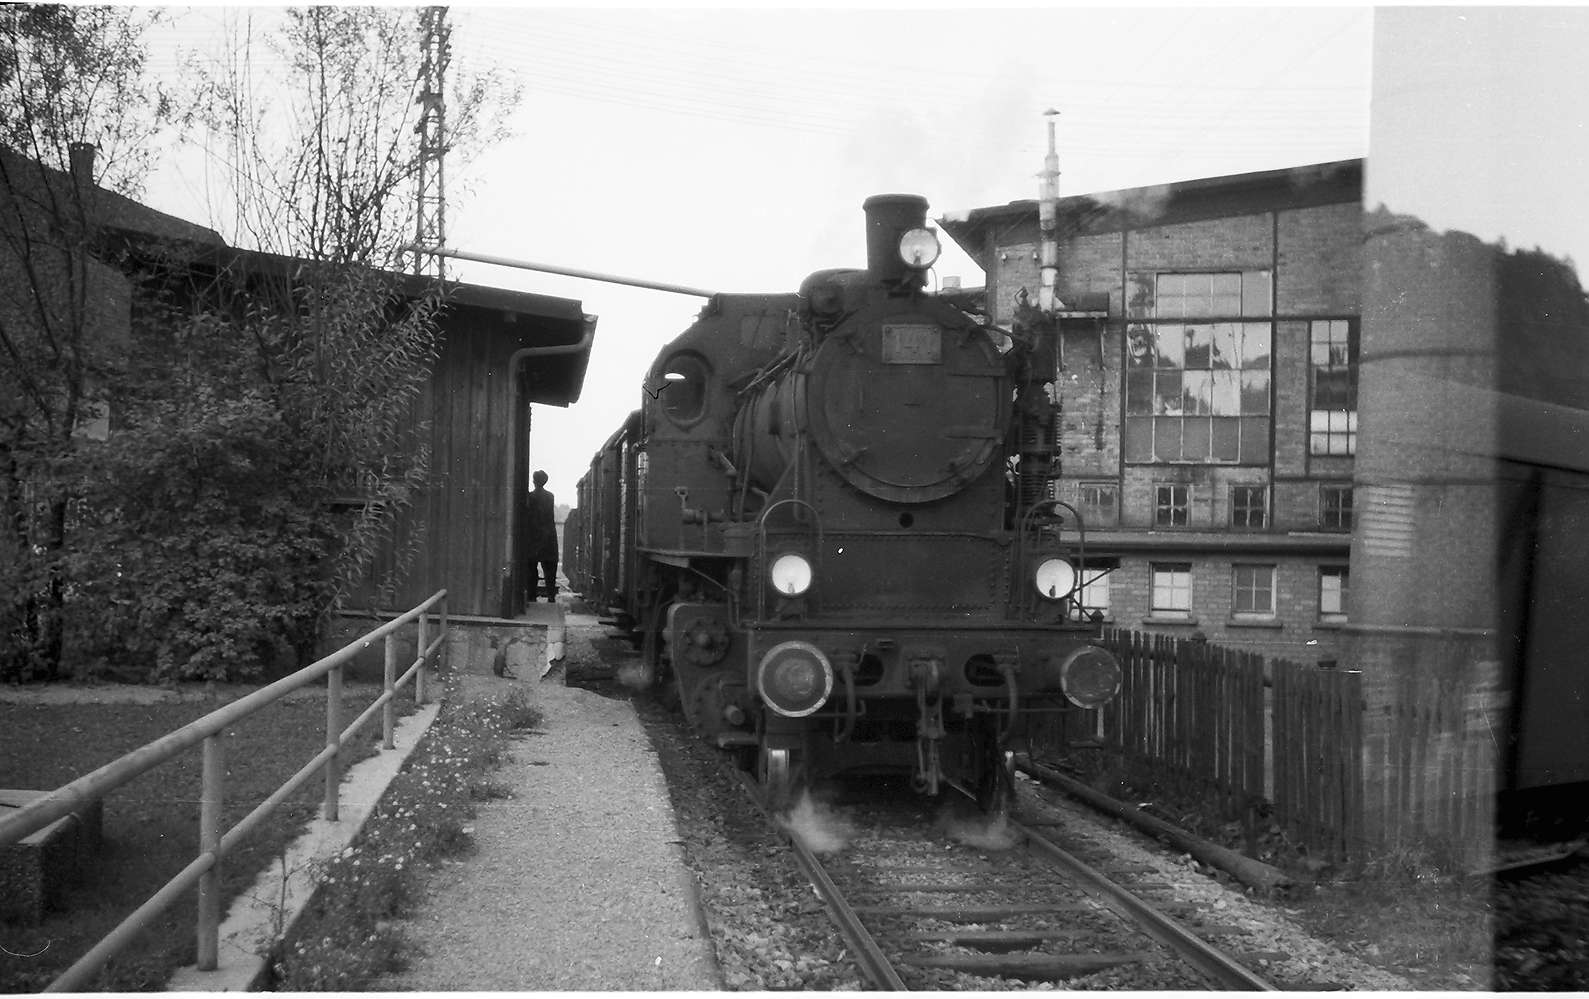 Lok 141, Haltepunkt Laucherthal, Bild 1